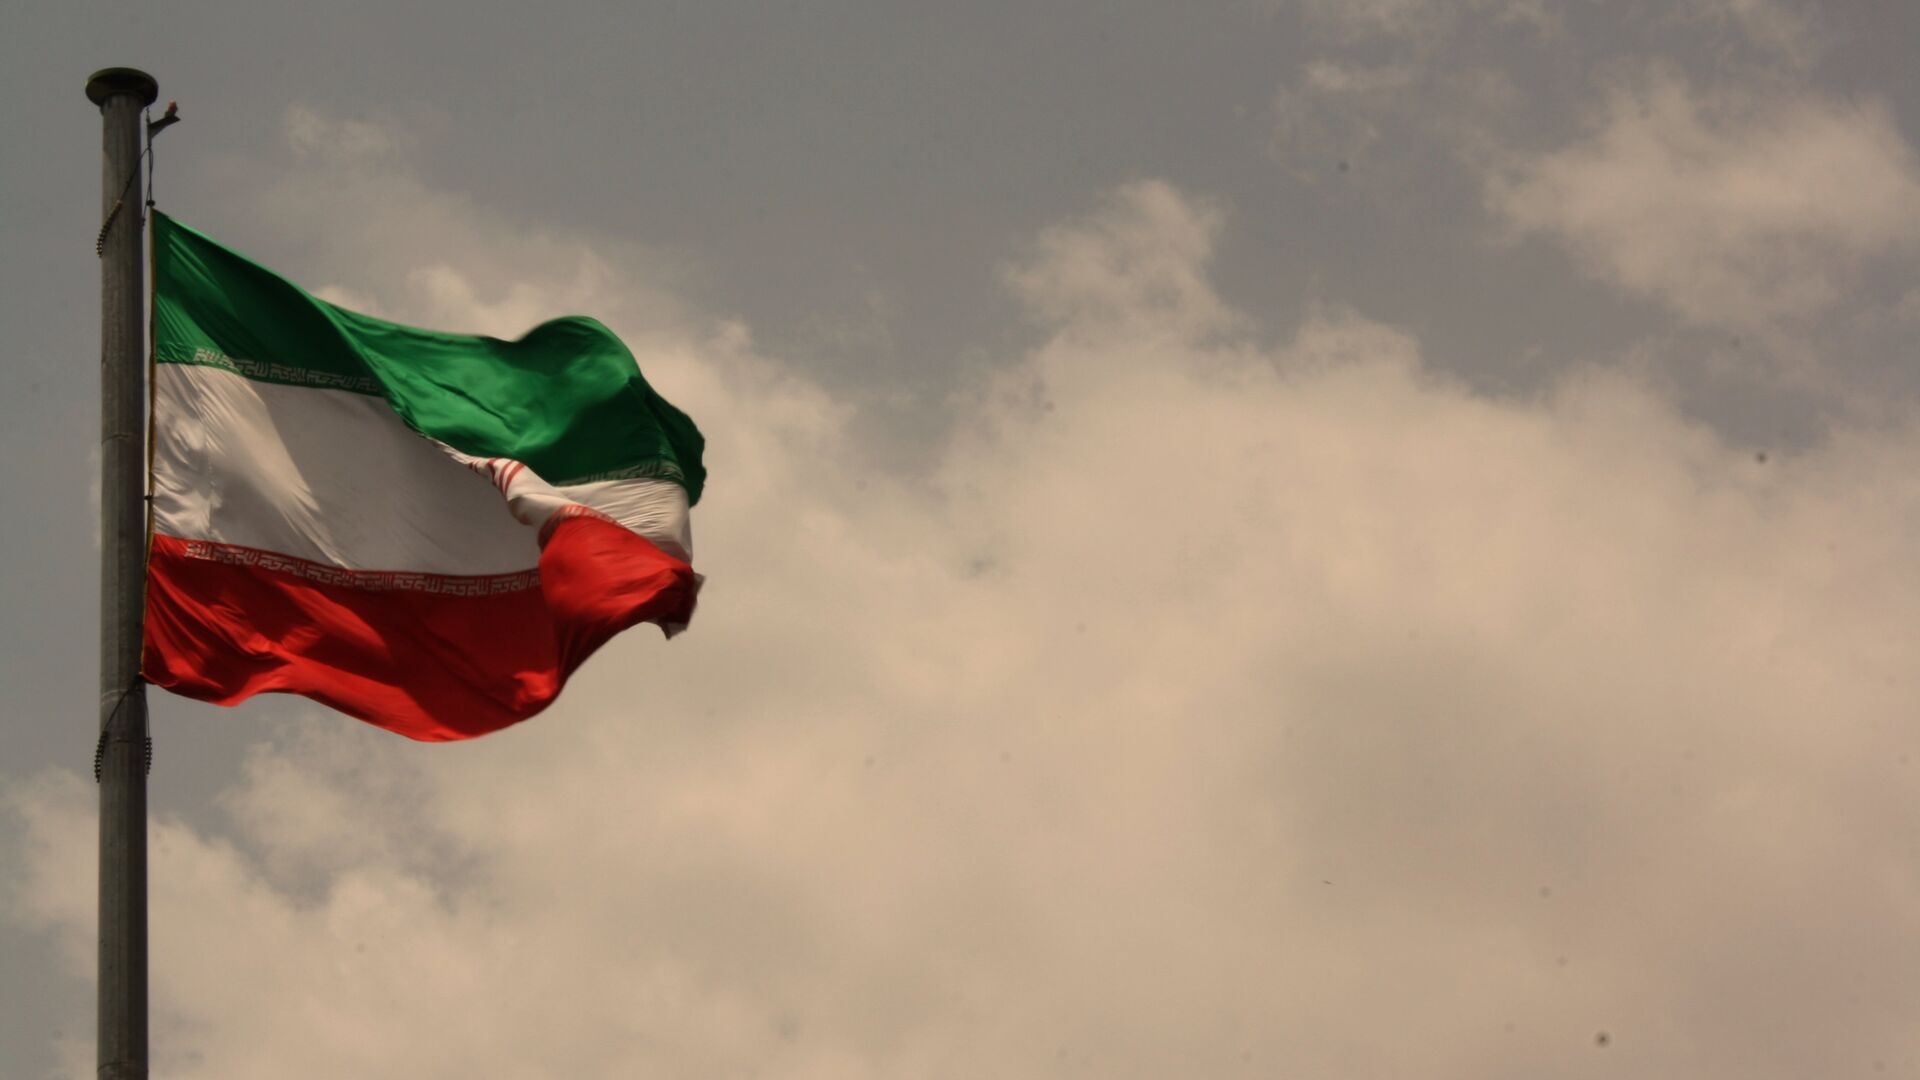 La bandera de Irán - Sputnik Mundo, 1920, 21.02.2021